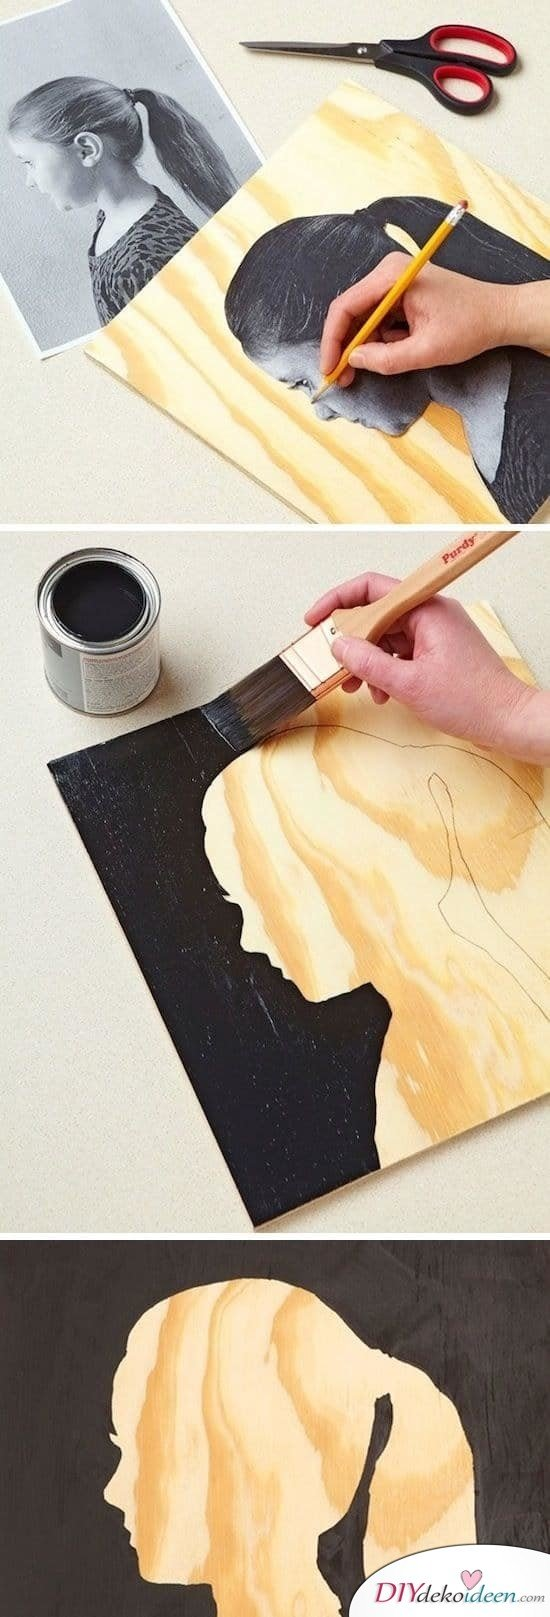 einfache Kunst selbermachen, Kunst malen, Bild malen, Bild basteln, Wanddeko, Wanddeko Idee, DIY Dekoideen, DIY Bastelideen